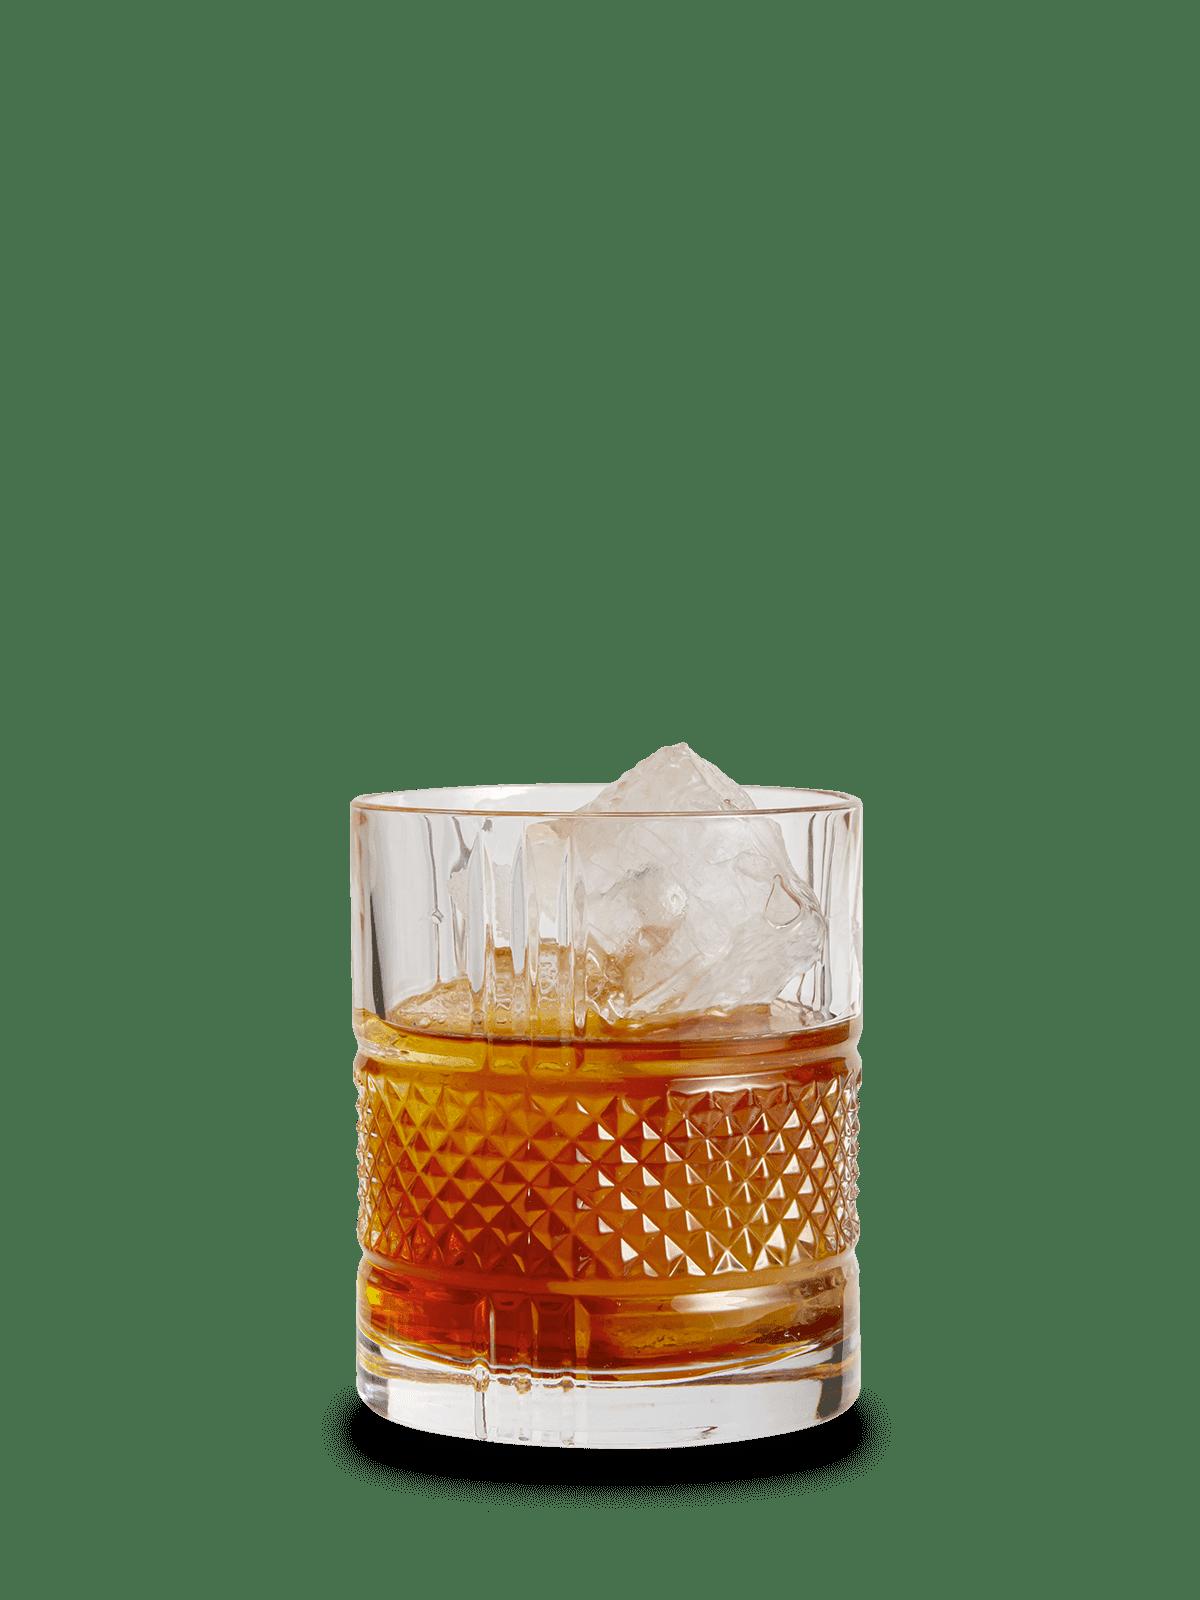 Taming Tarragon Cocktail Rezept mit Wagemut PX Cask Barbados Rum